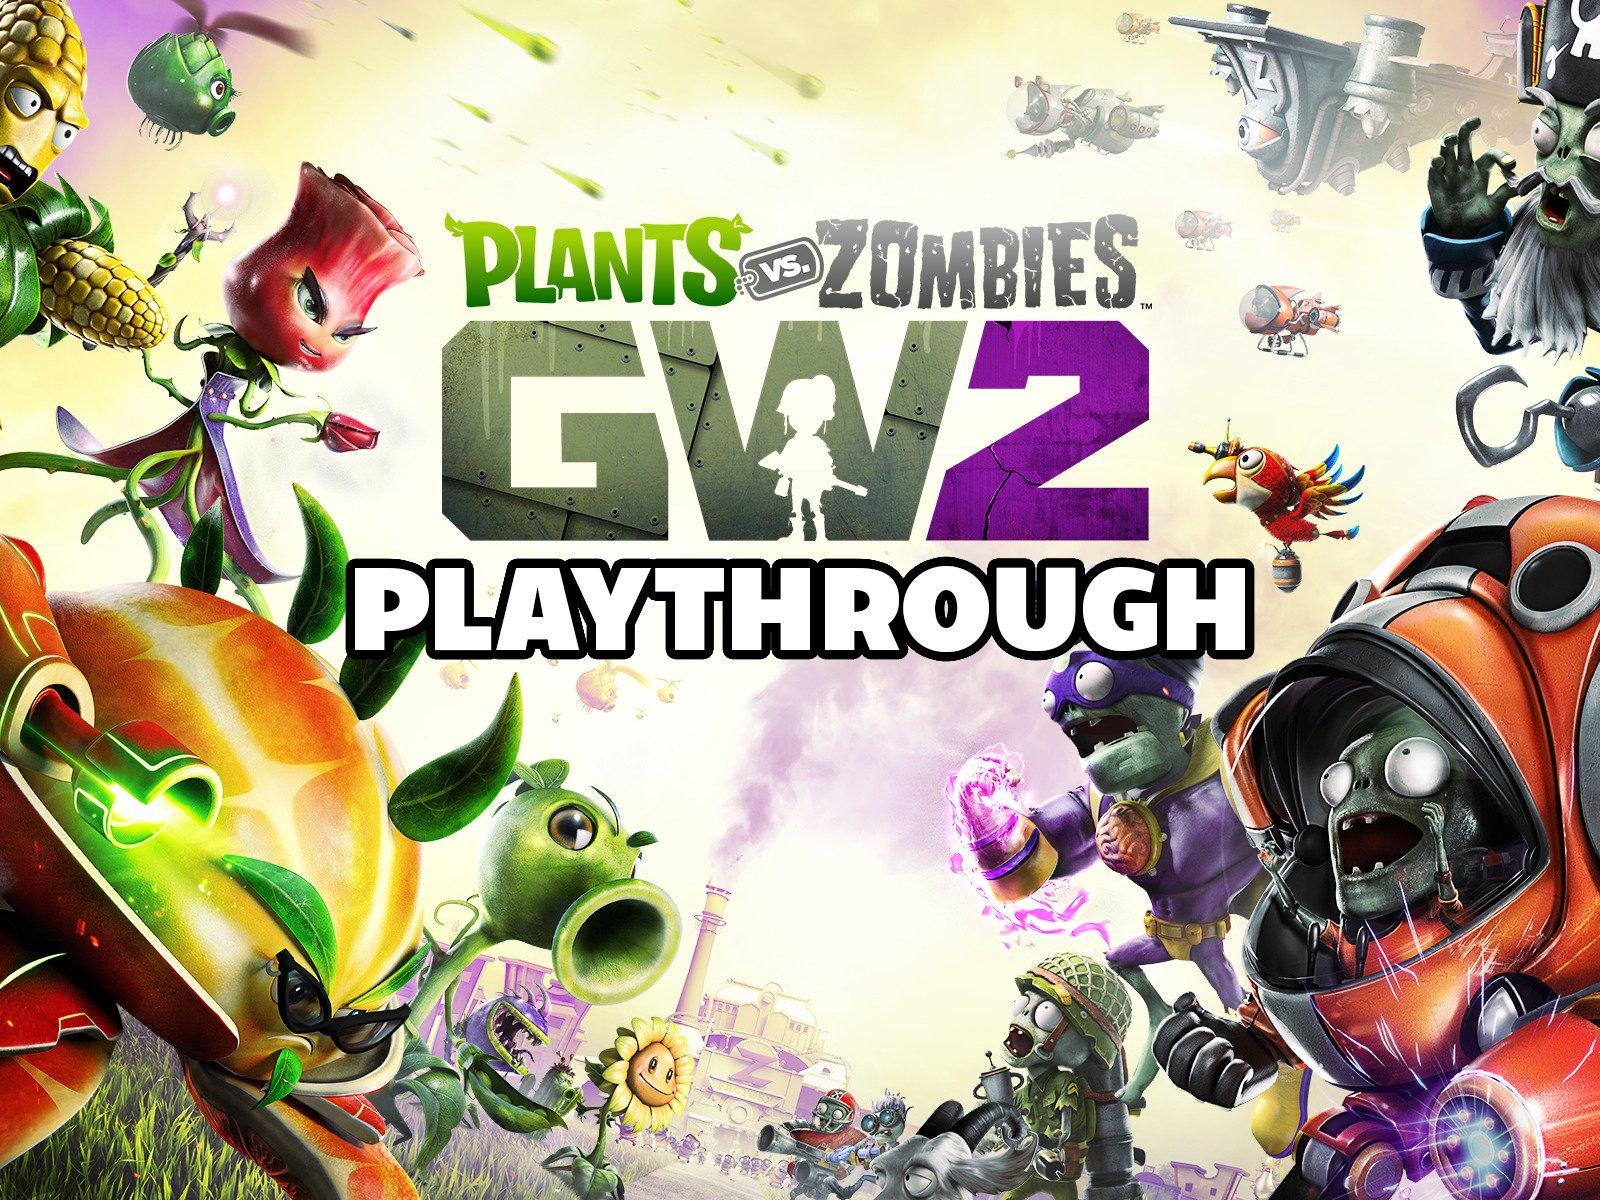 Clip: Plants Vs. Zombies GW2 Playthrough - Season 1